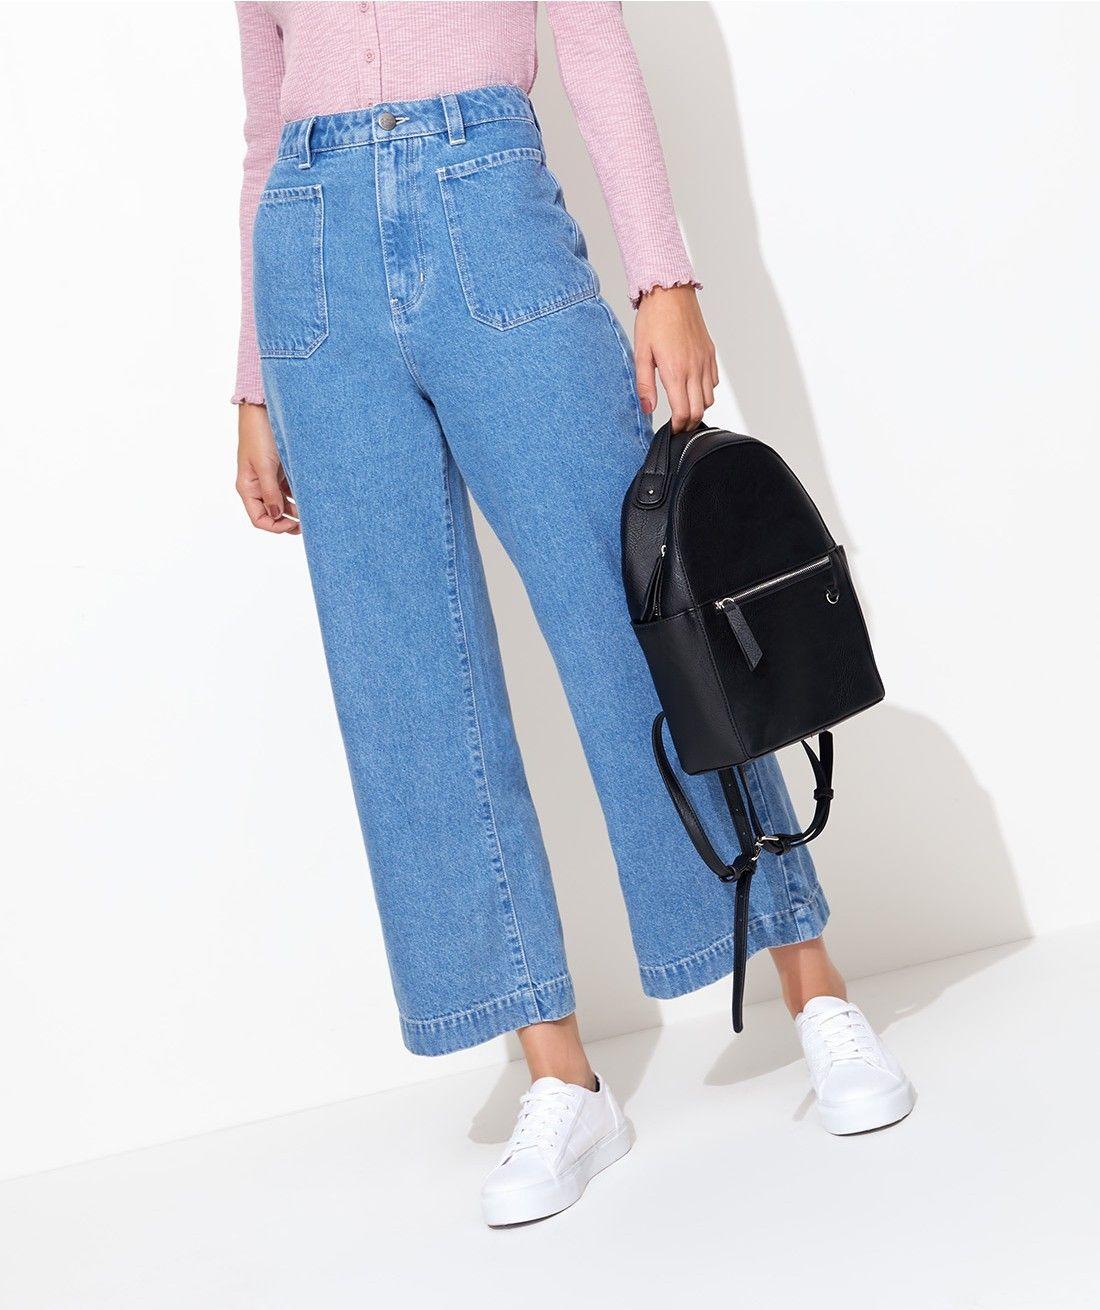 Denim - Retro Jean - Clothing - Sportsgirl   Clothes, Retro jeans, Online  womens clothing